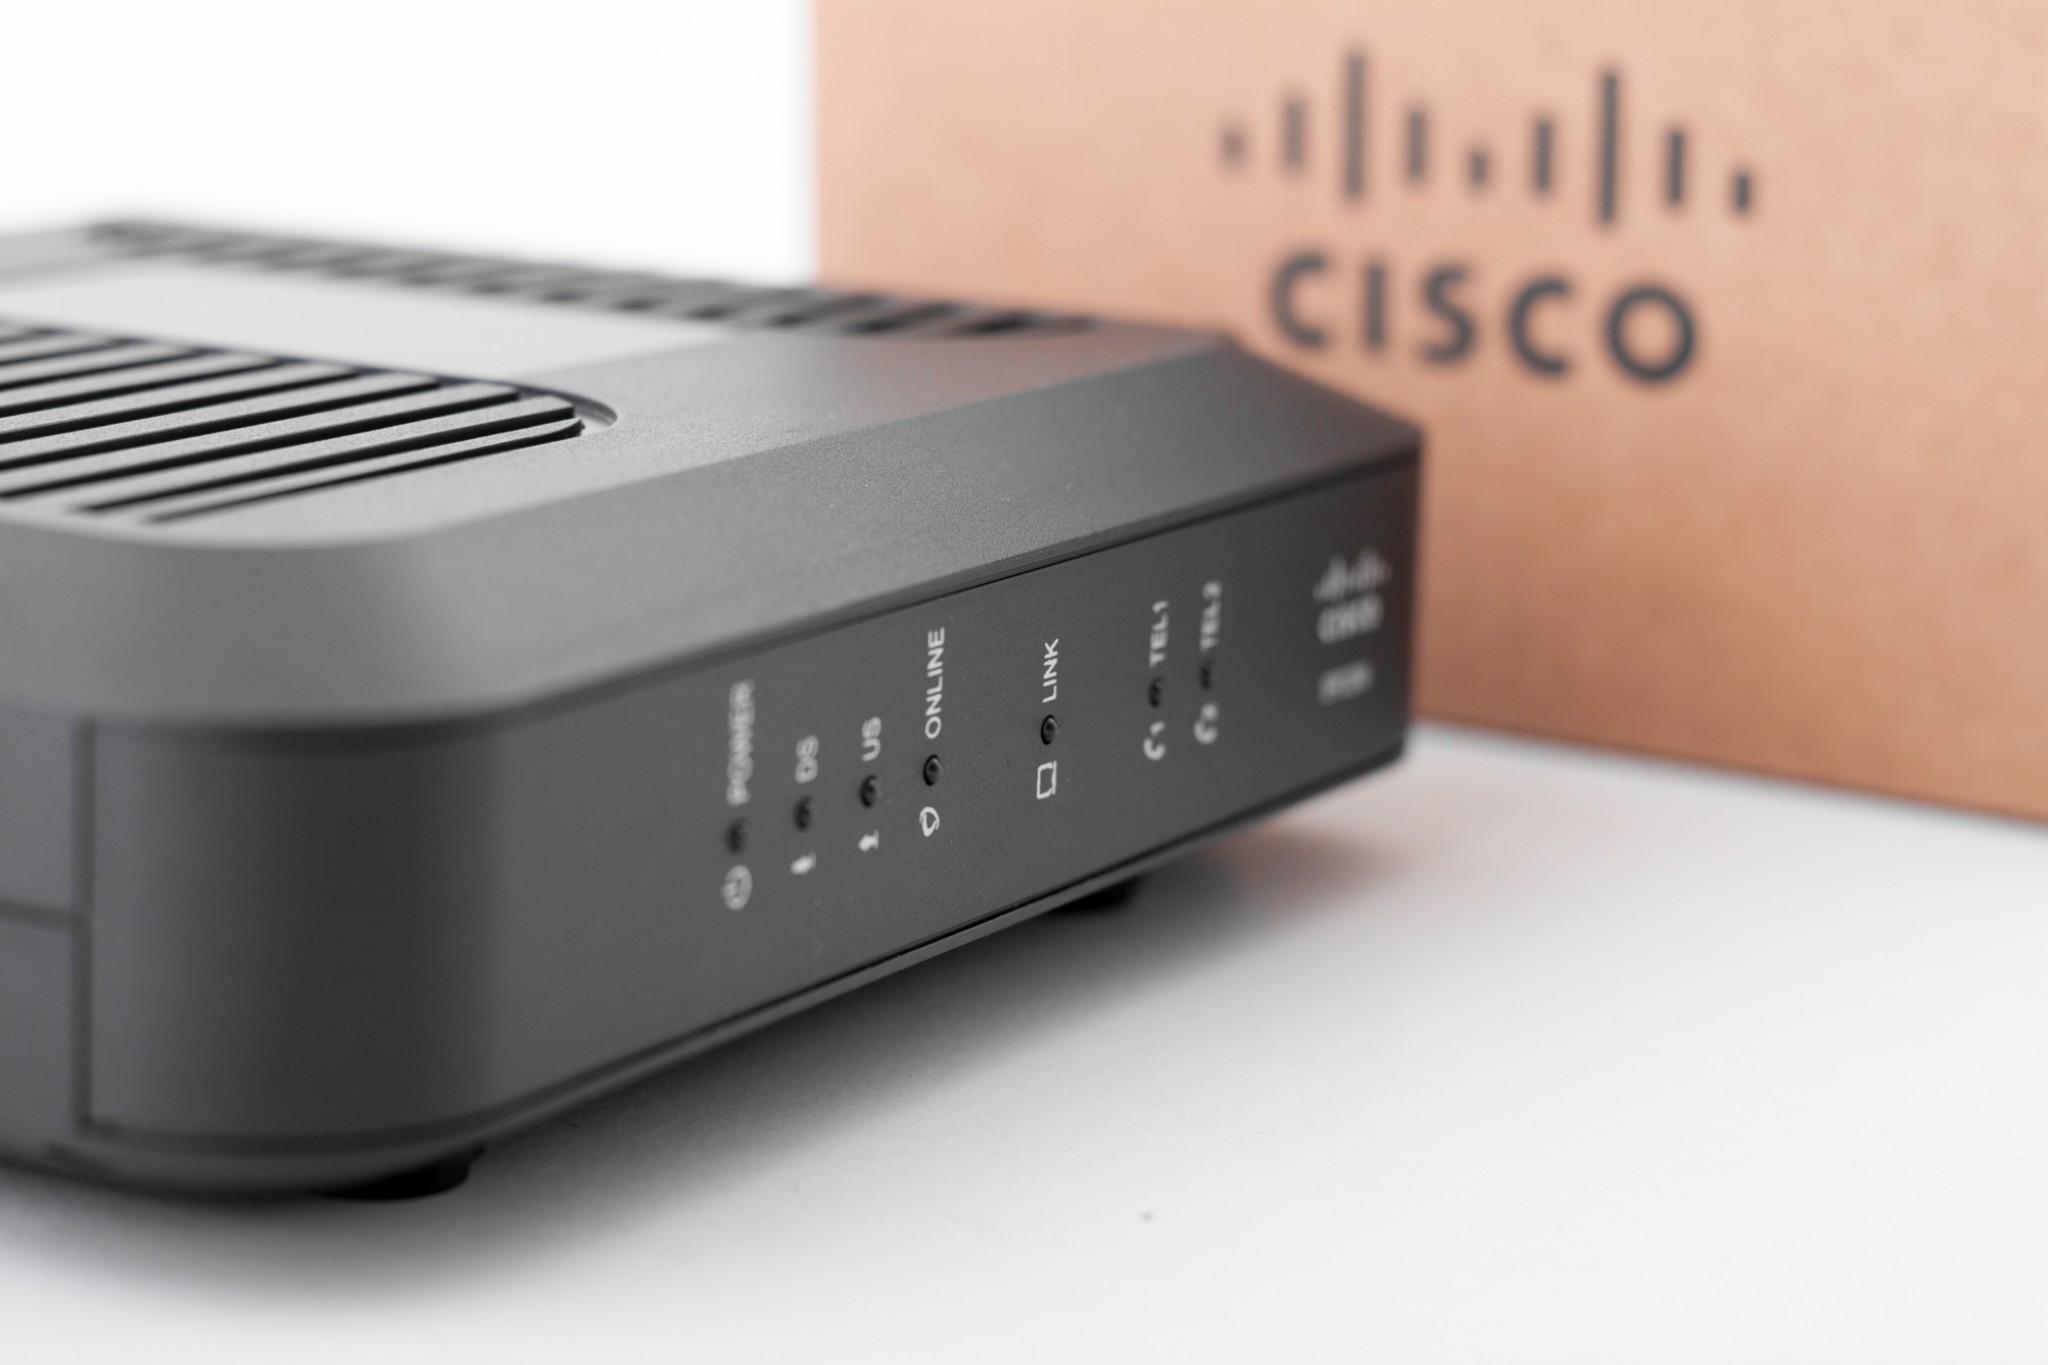 Cisco Dta Adapter – HD Wallpapers